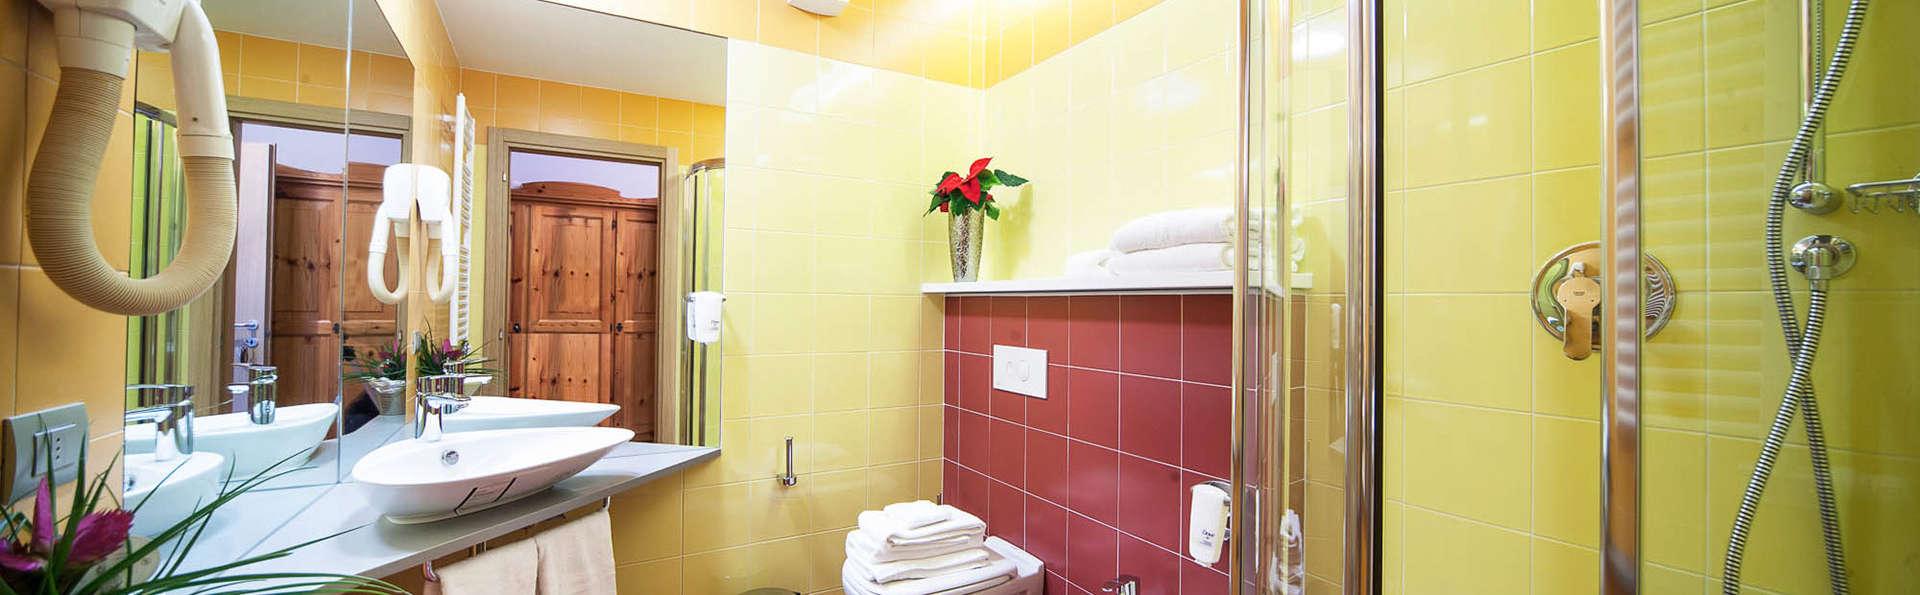 Hotel Villaggio Nevada - Edit_bath3.jpg